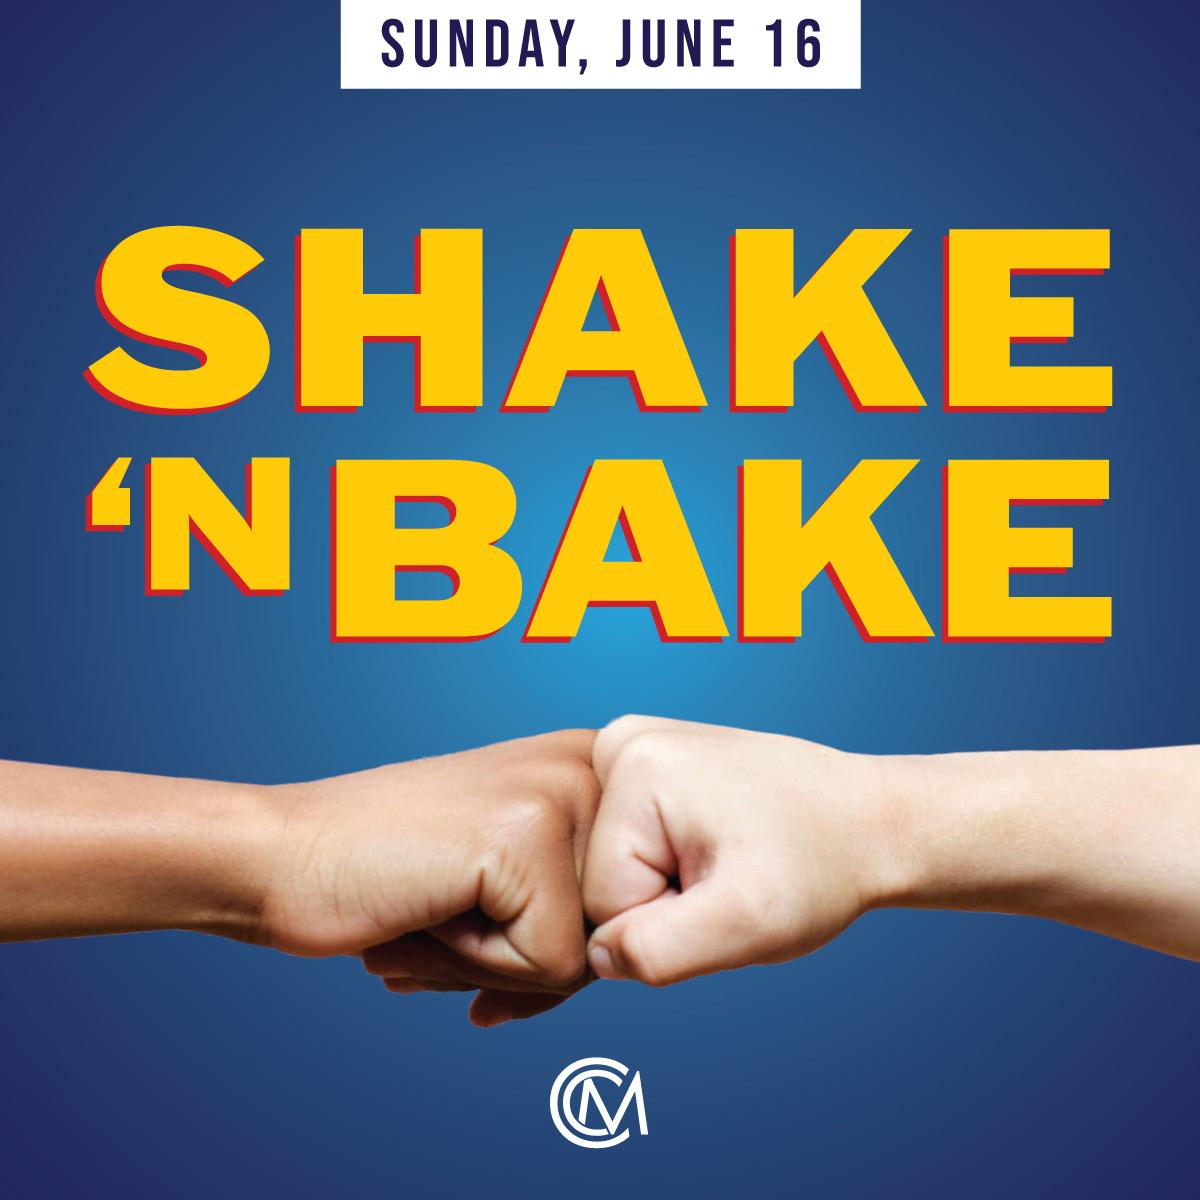 CCM-Shake&Bake-June16.jpg